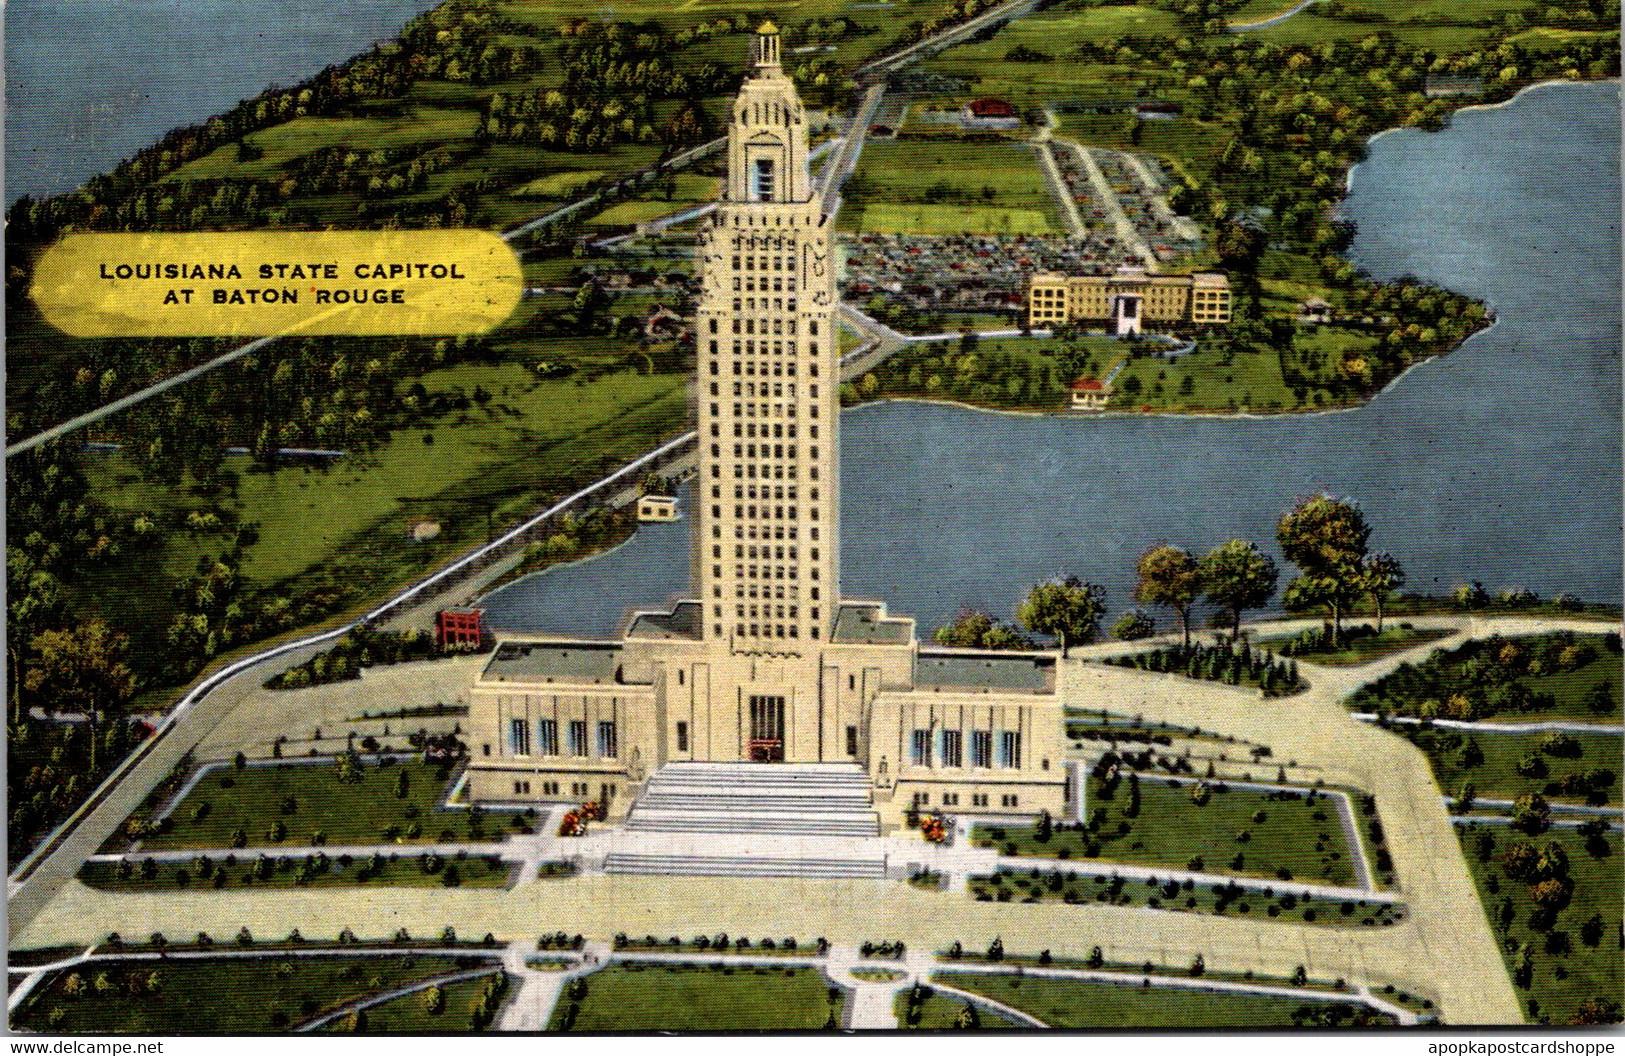 Louisiana Baton Rouge Aerial View State Capitol Building - Baton Rouge